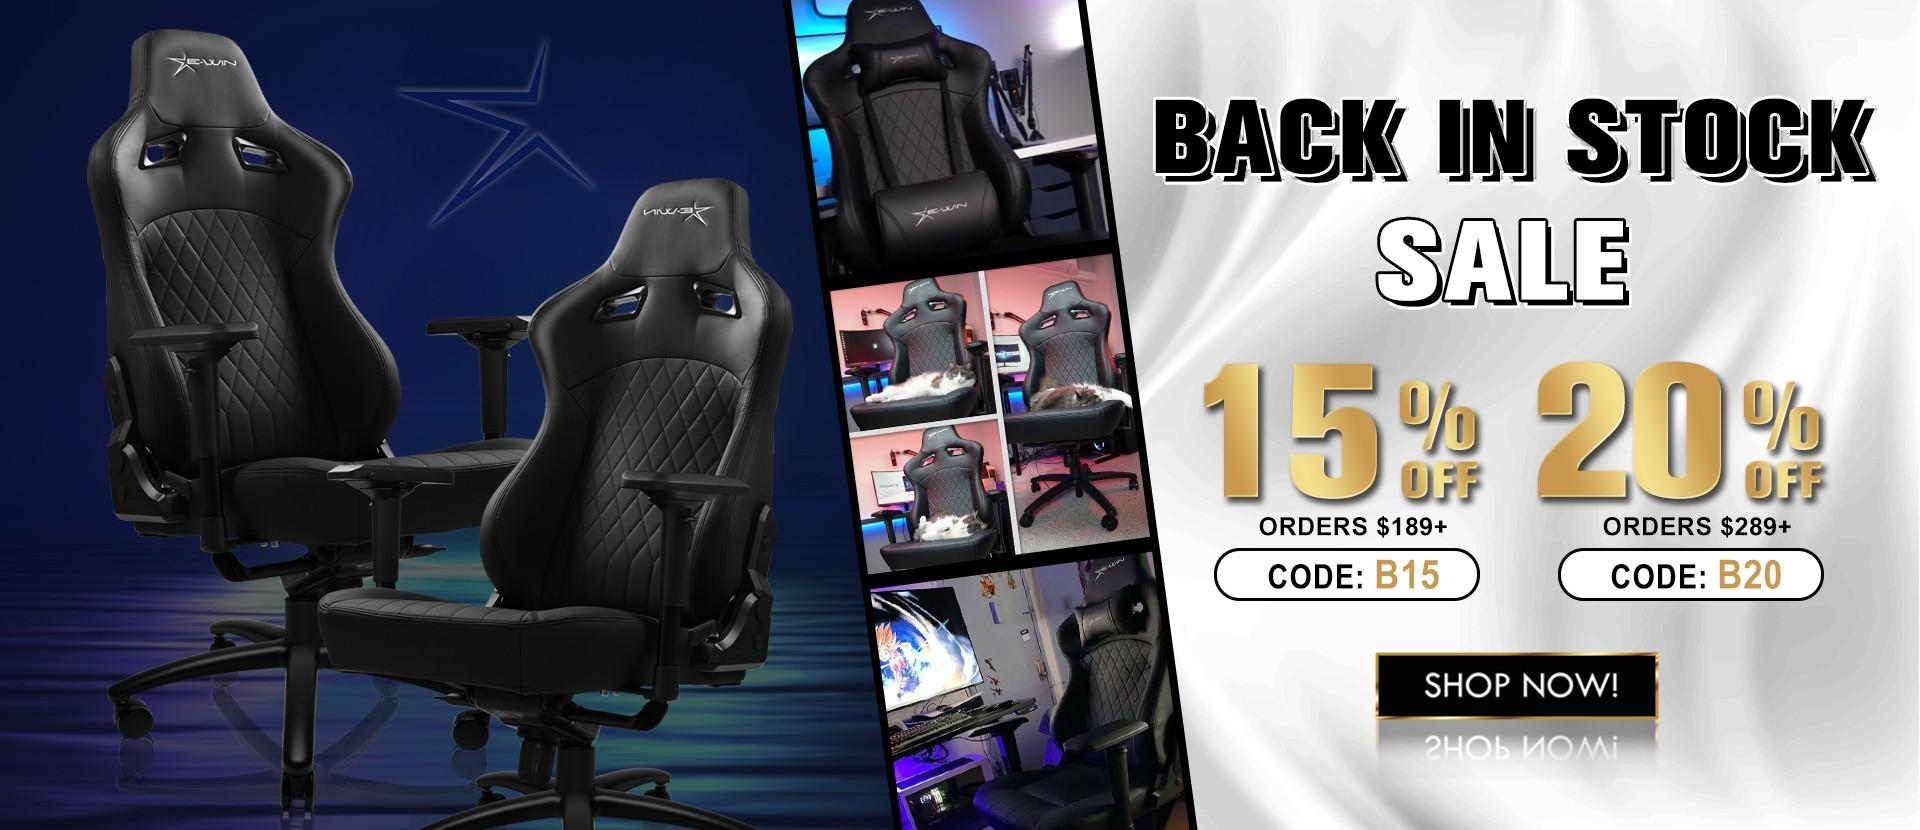 E-WIN Back in Stock Sale 2021